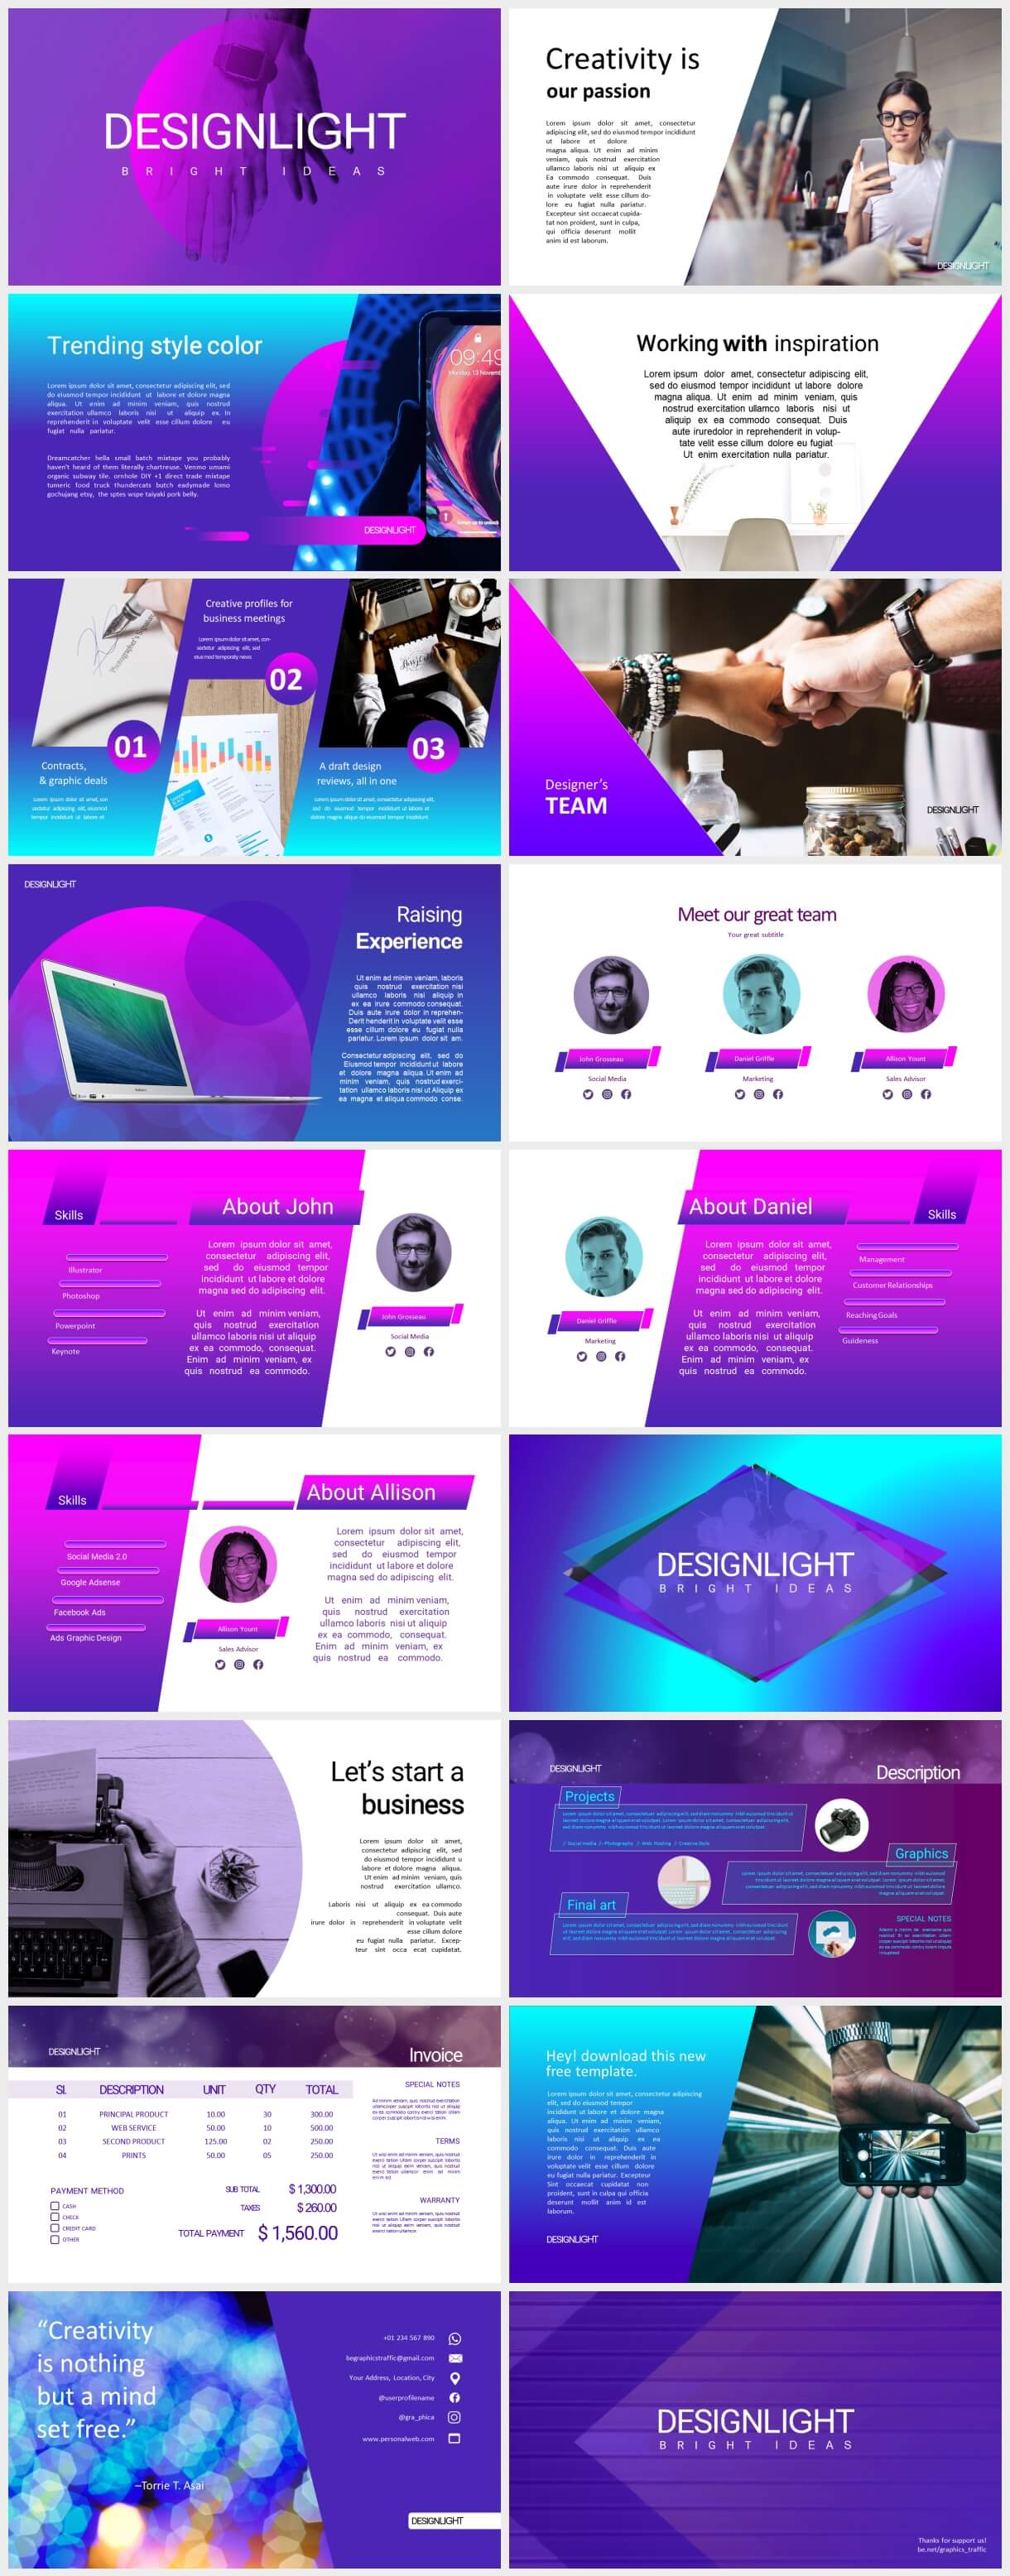 design light free ppt template by graphics traffic - Design Light Free PowerPoint Presentation - Team, Startup, purple, Portfolio, Creative